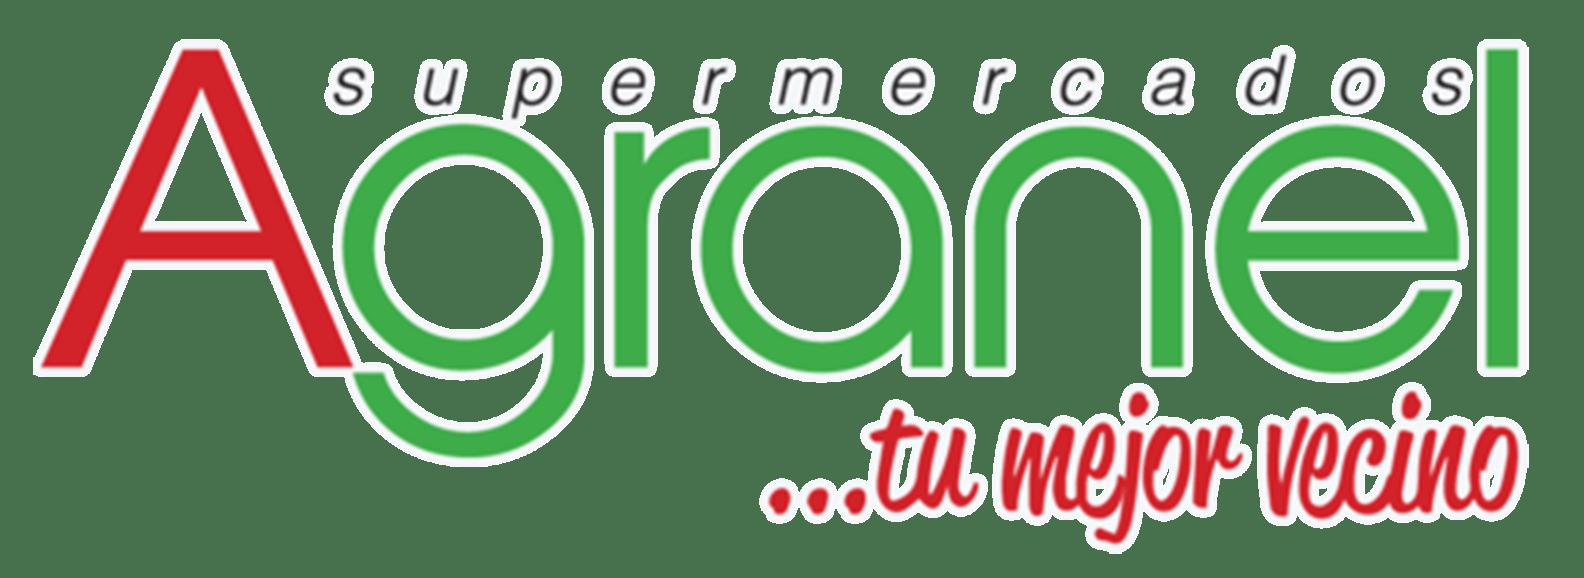 Agranel logo.